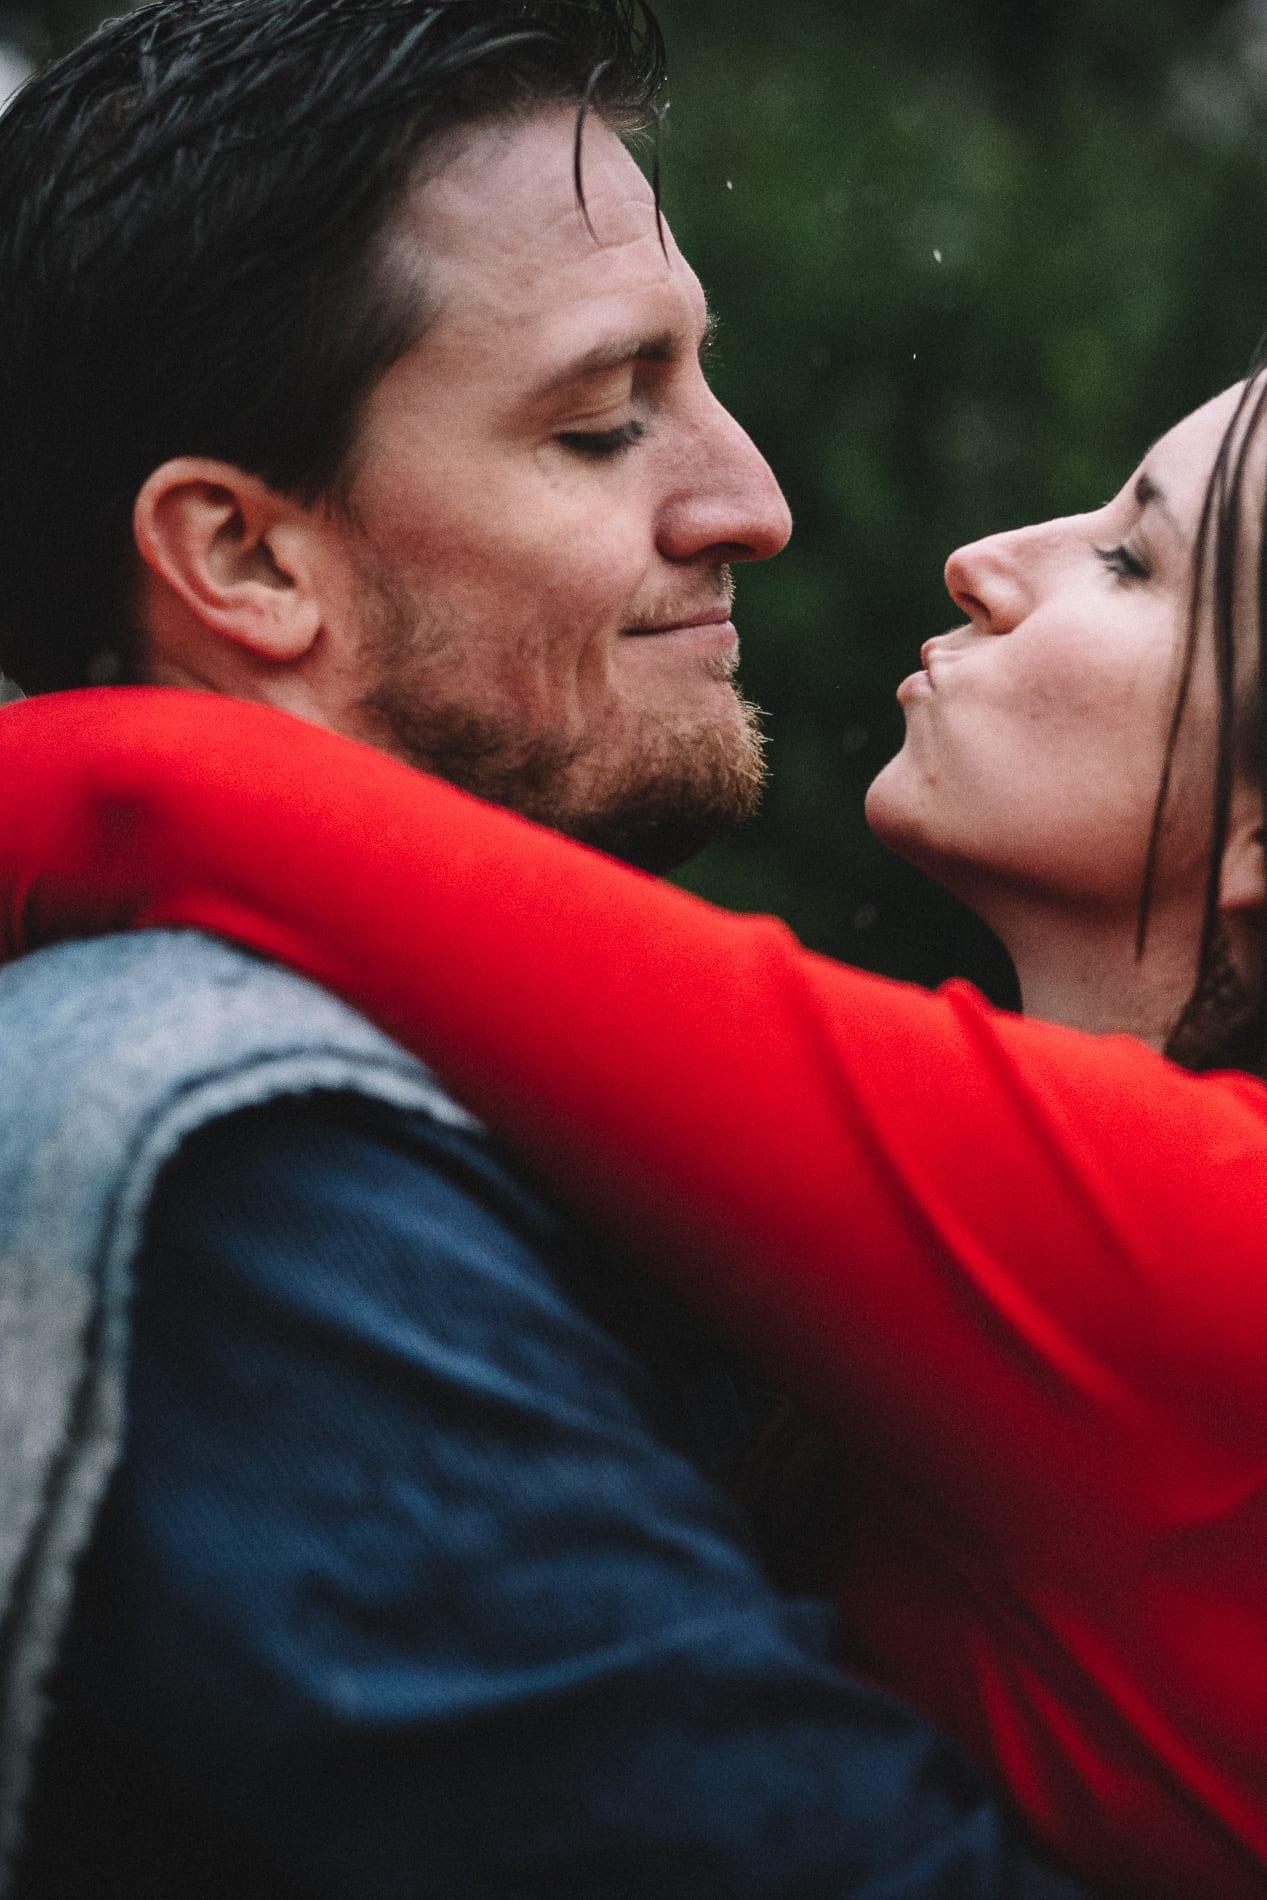 redding-caldwell-lake-park-gazebo-couples-photo-12